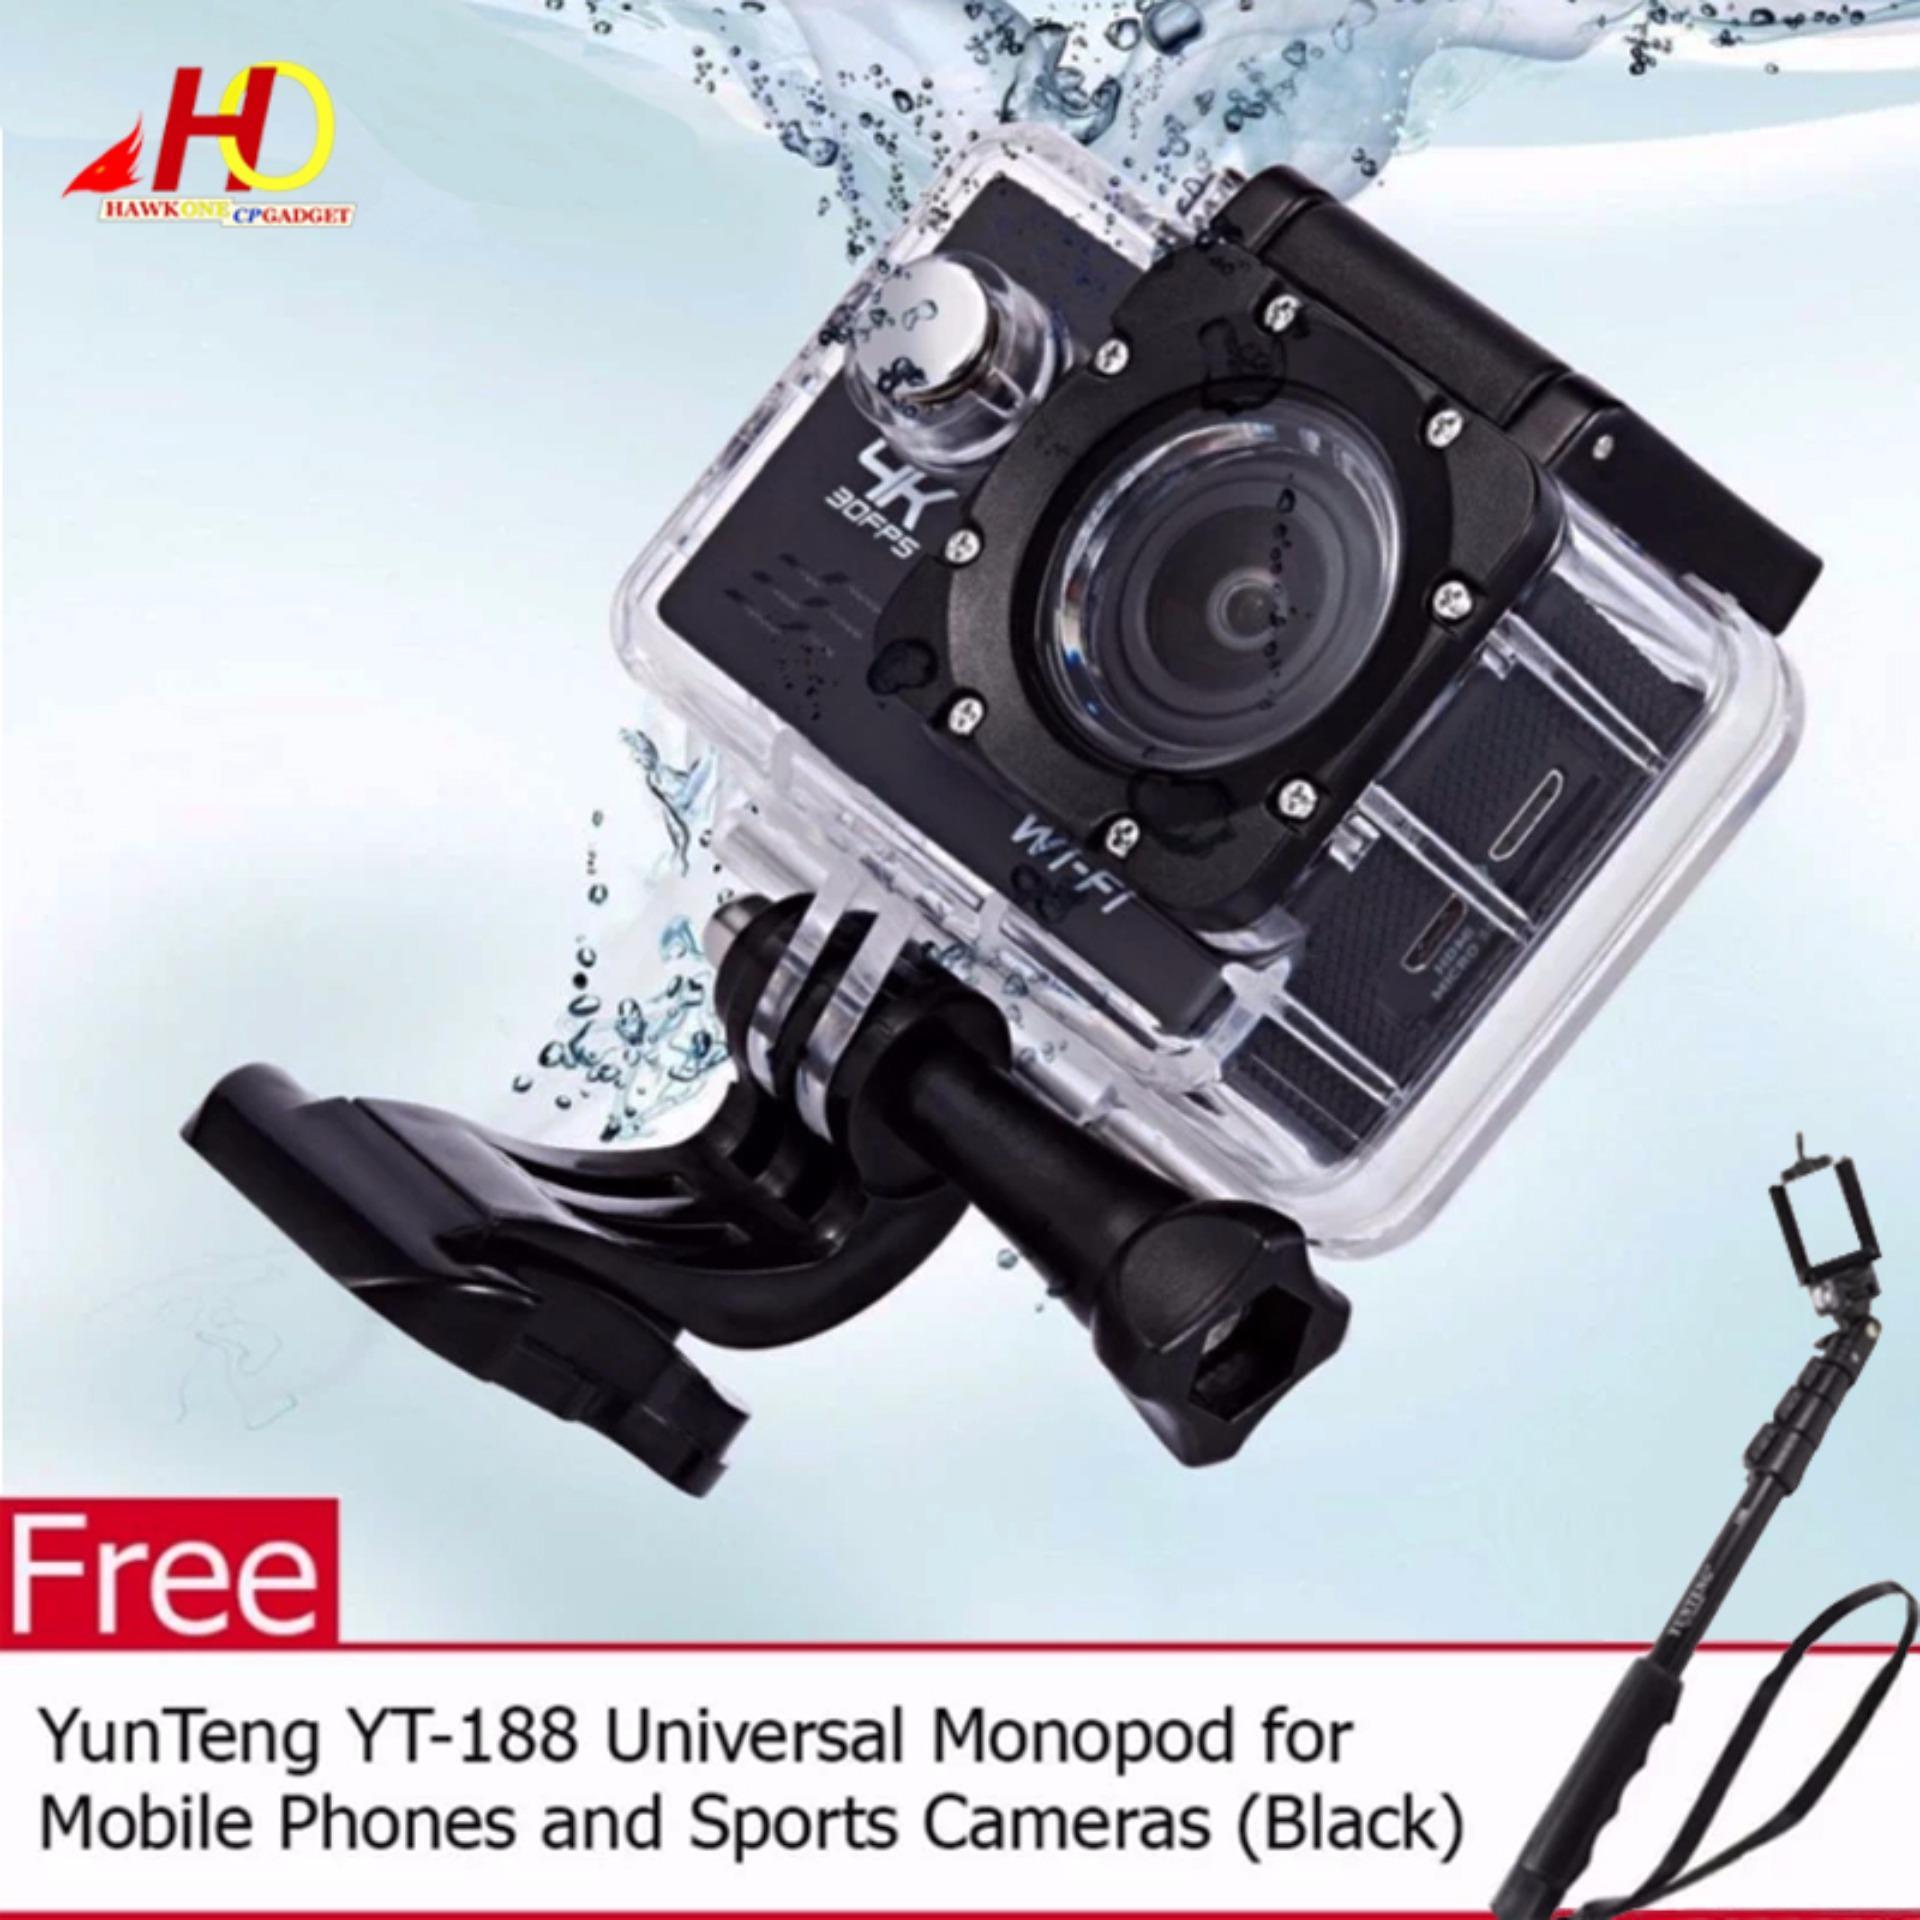 Sports Hd Dv Camera Review 18 Adult Webcam Jobs Cam Action Sport Mini 1080p H264 Full No Wifi W8 4k Ultra 16mp Black